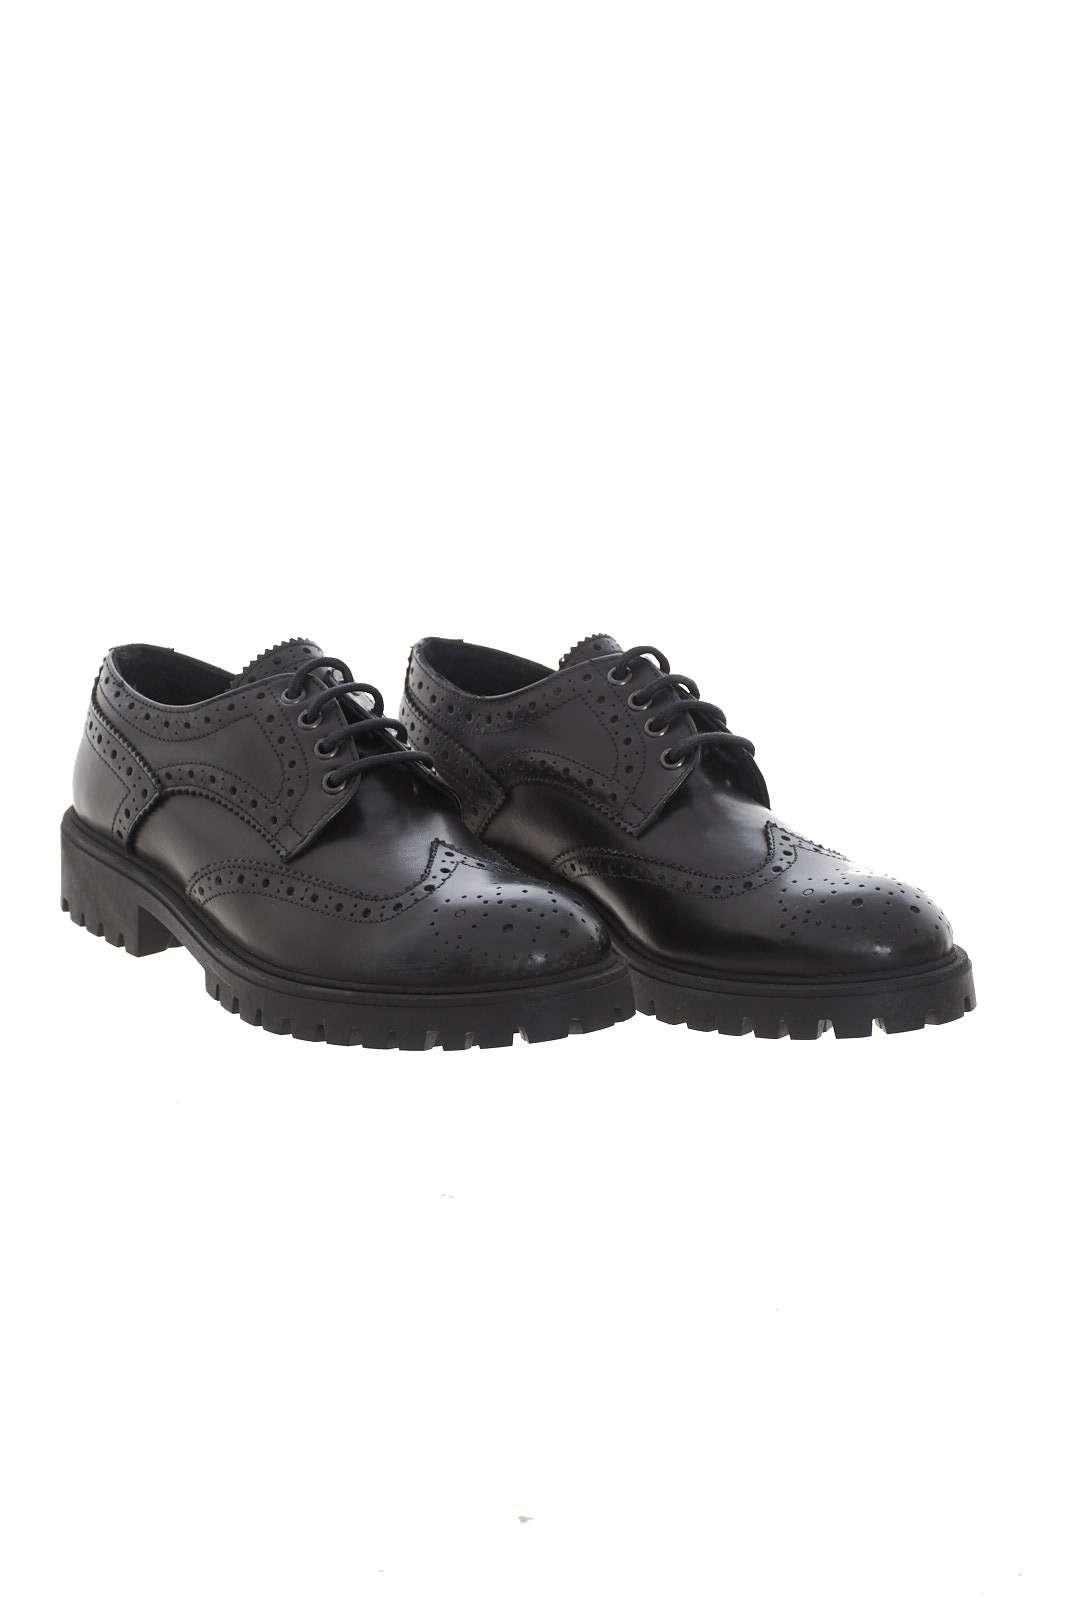 AI-outlet_parmax-scarpe-uomo-Romeo-Gigli-361vitner